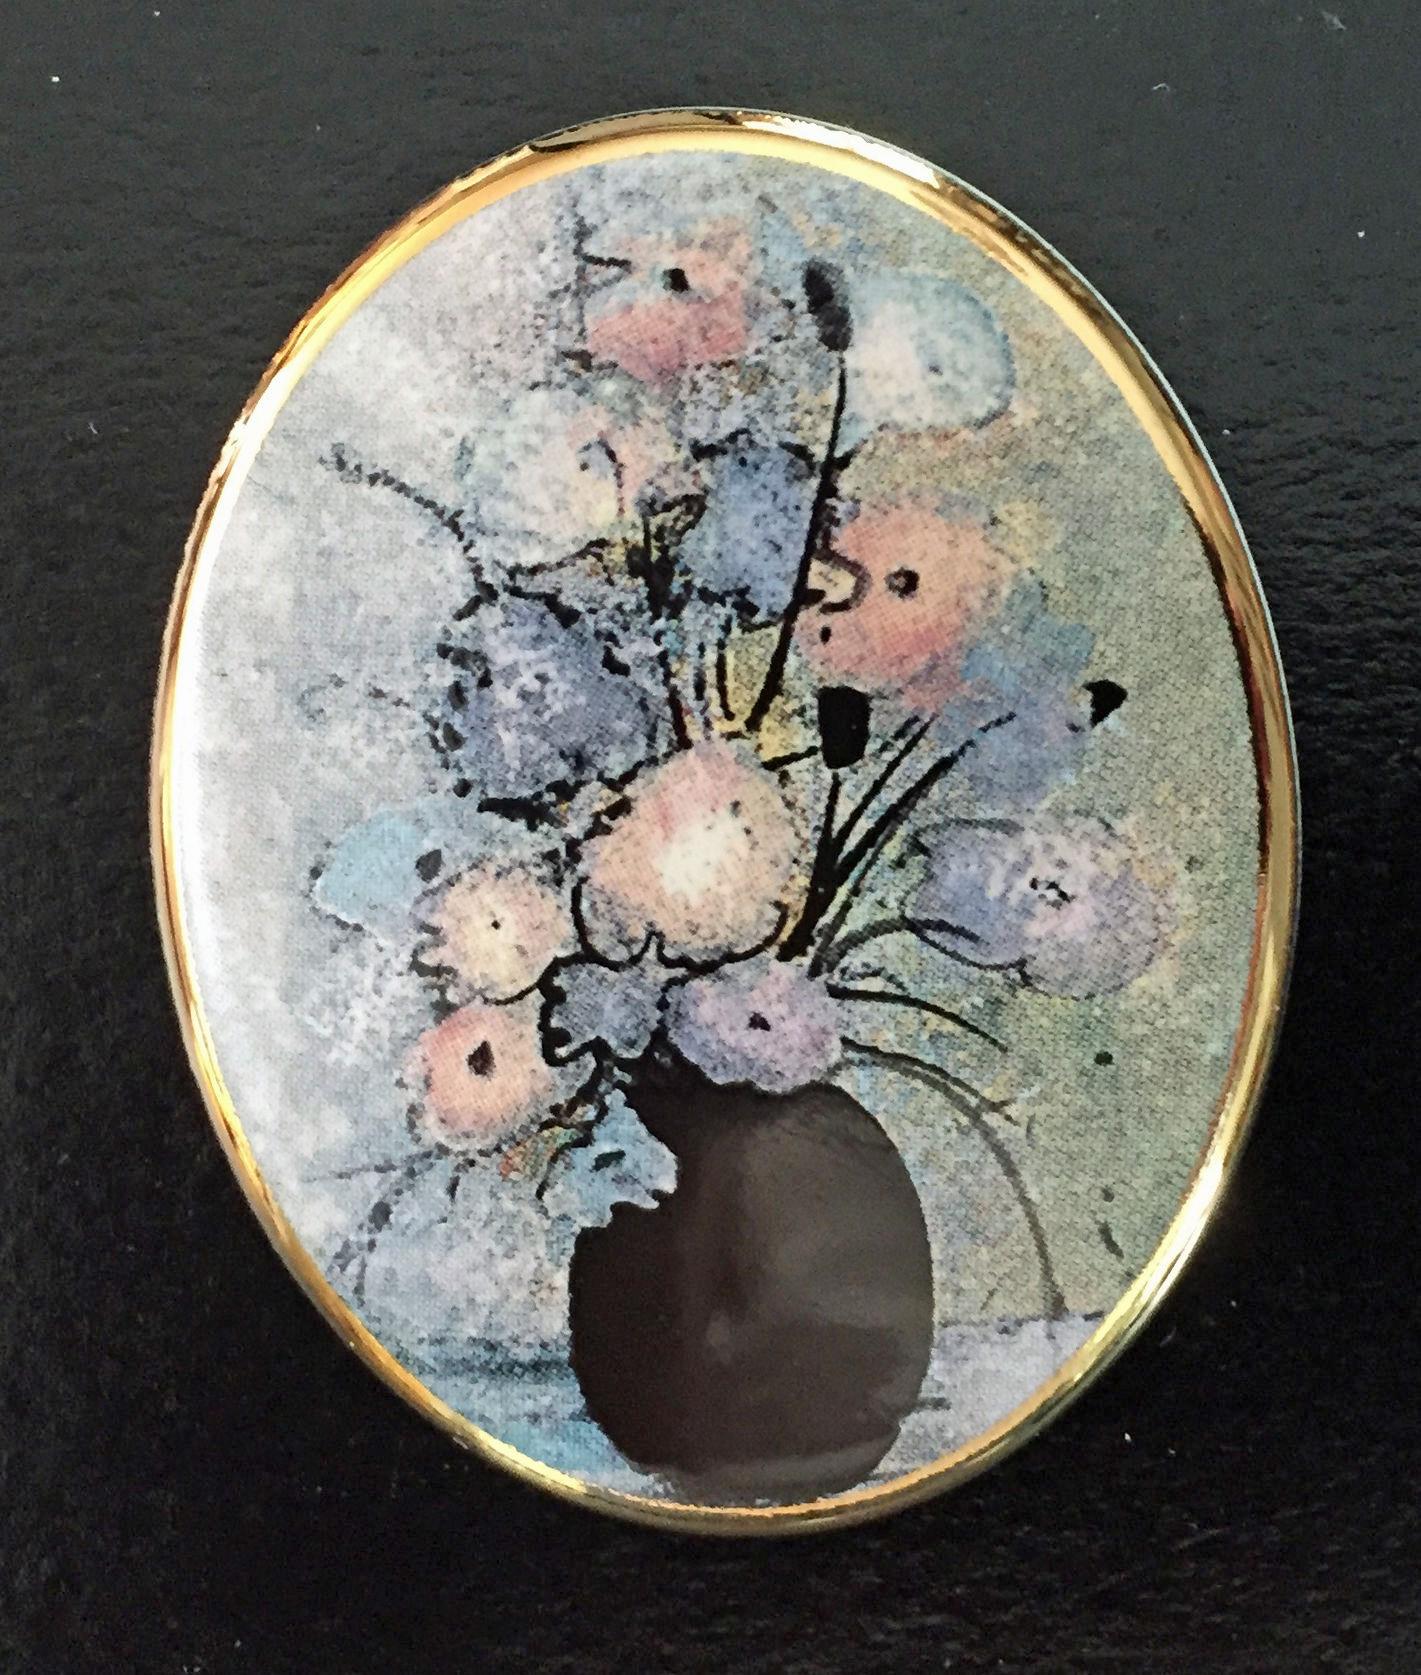 P Buckley Moss Jewelry